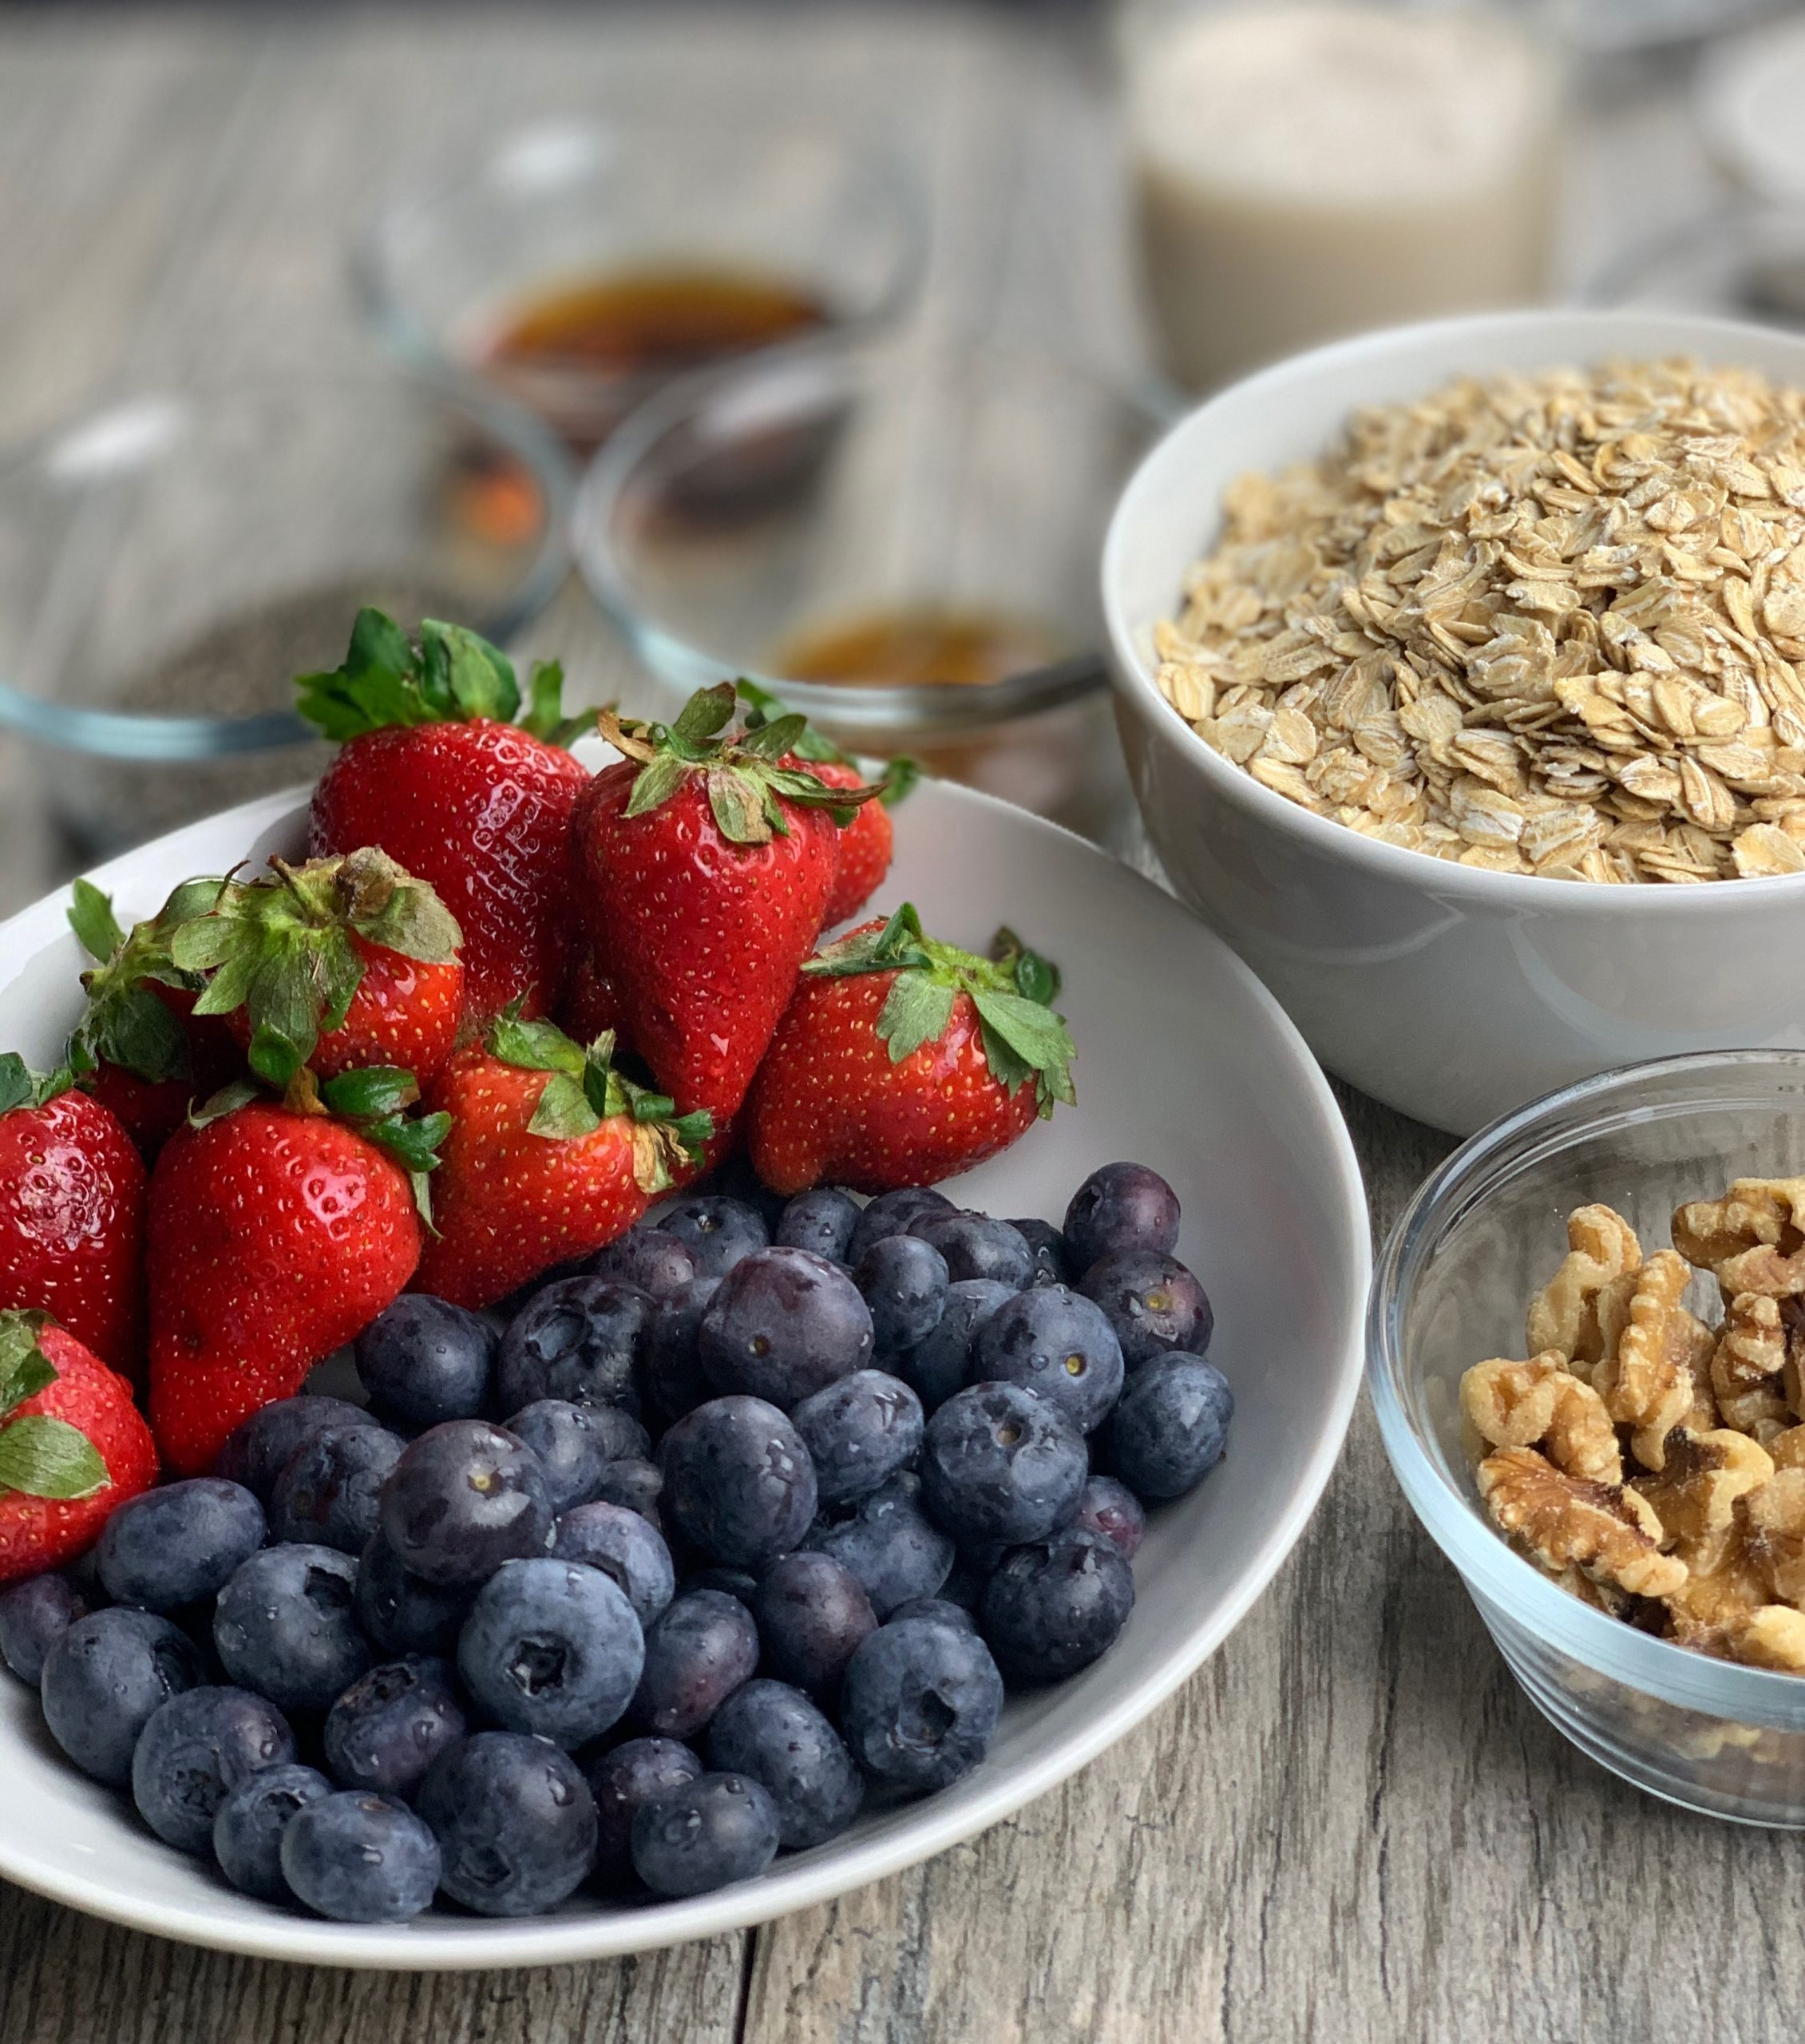 Ingredients Oatmeal Berry Bake for Breakfast